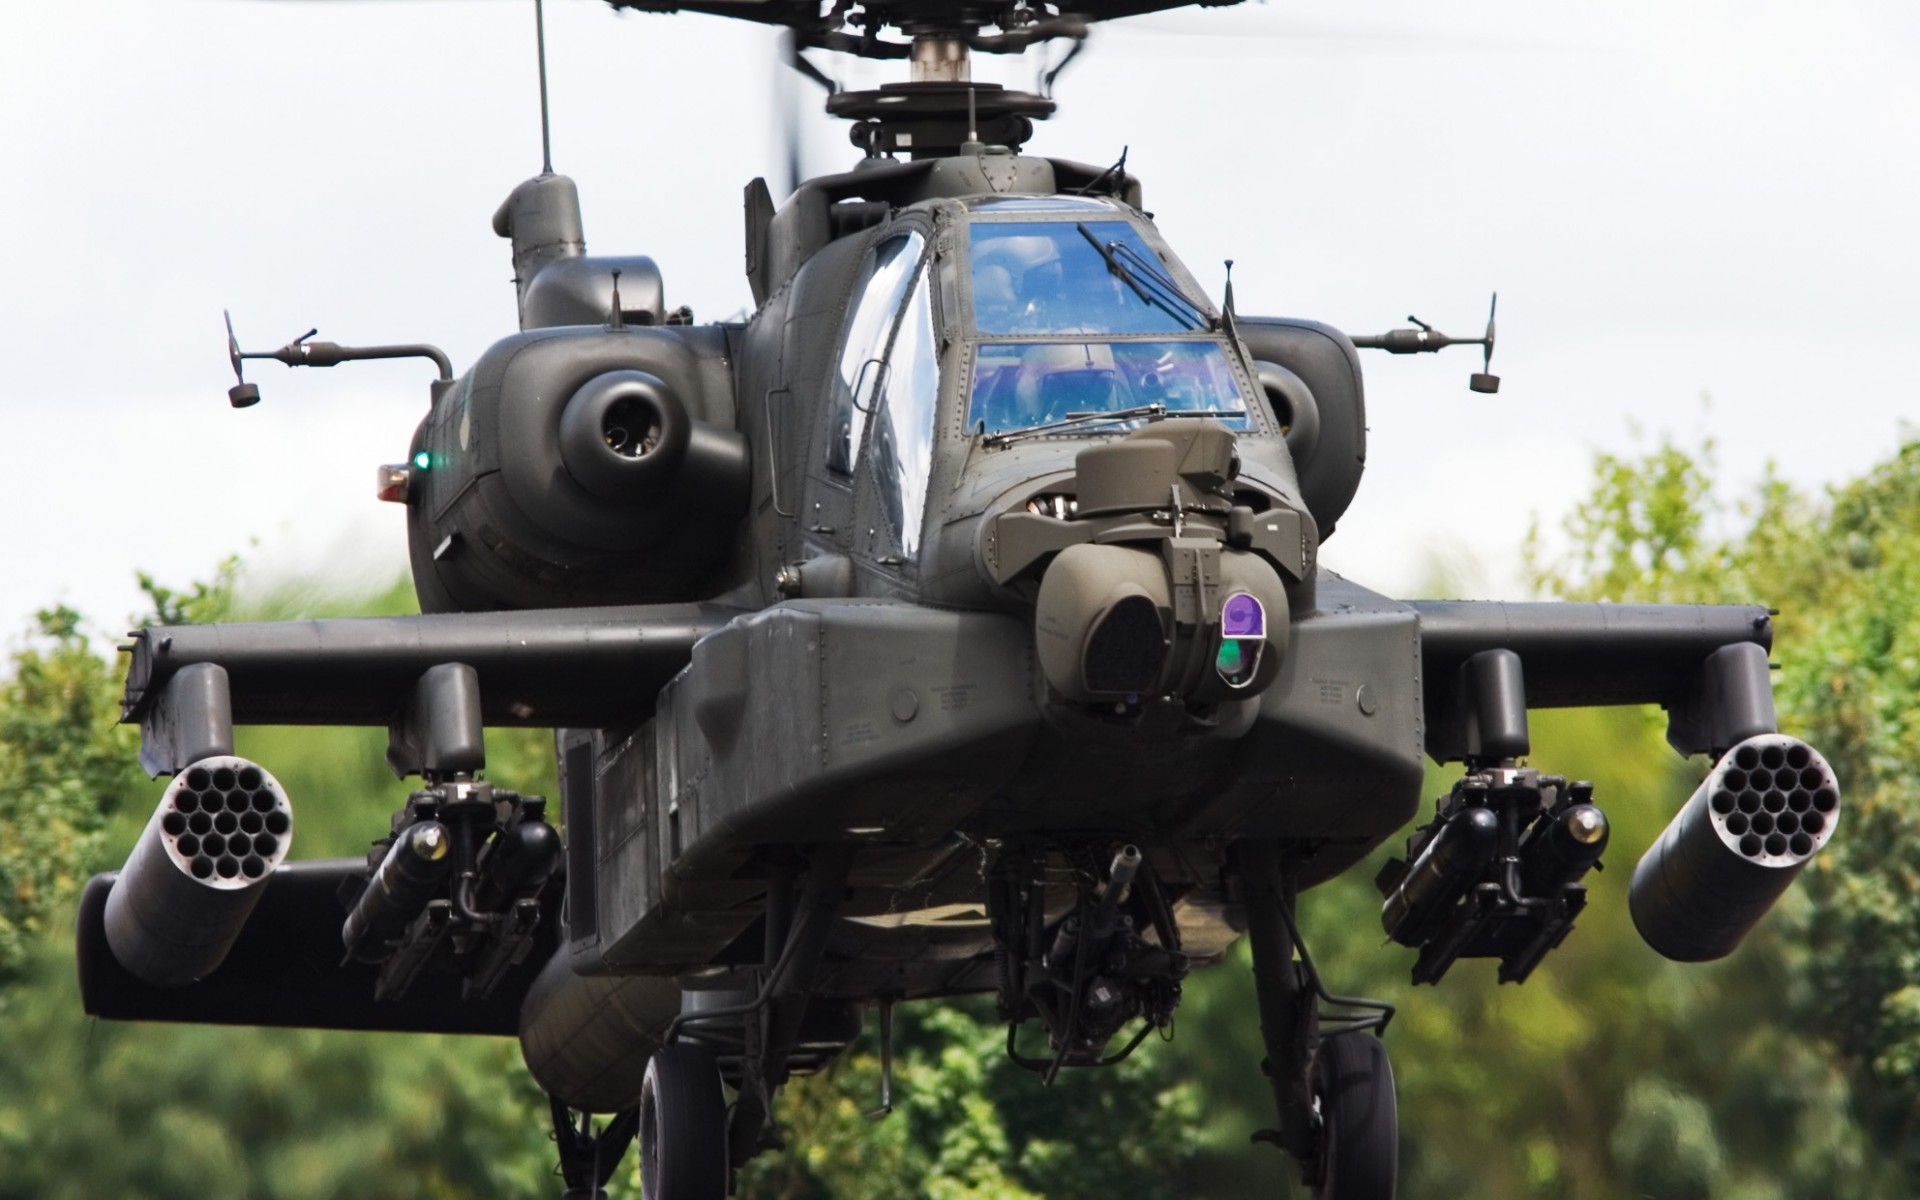 Apache Helicopter HD Wallpaper Wallpaper size 1920x1200 1920x1200